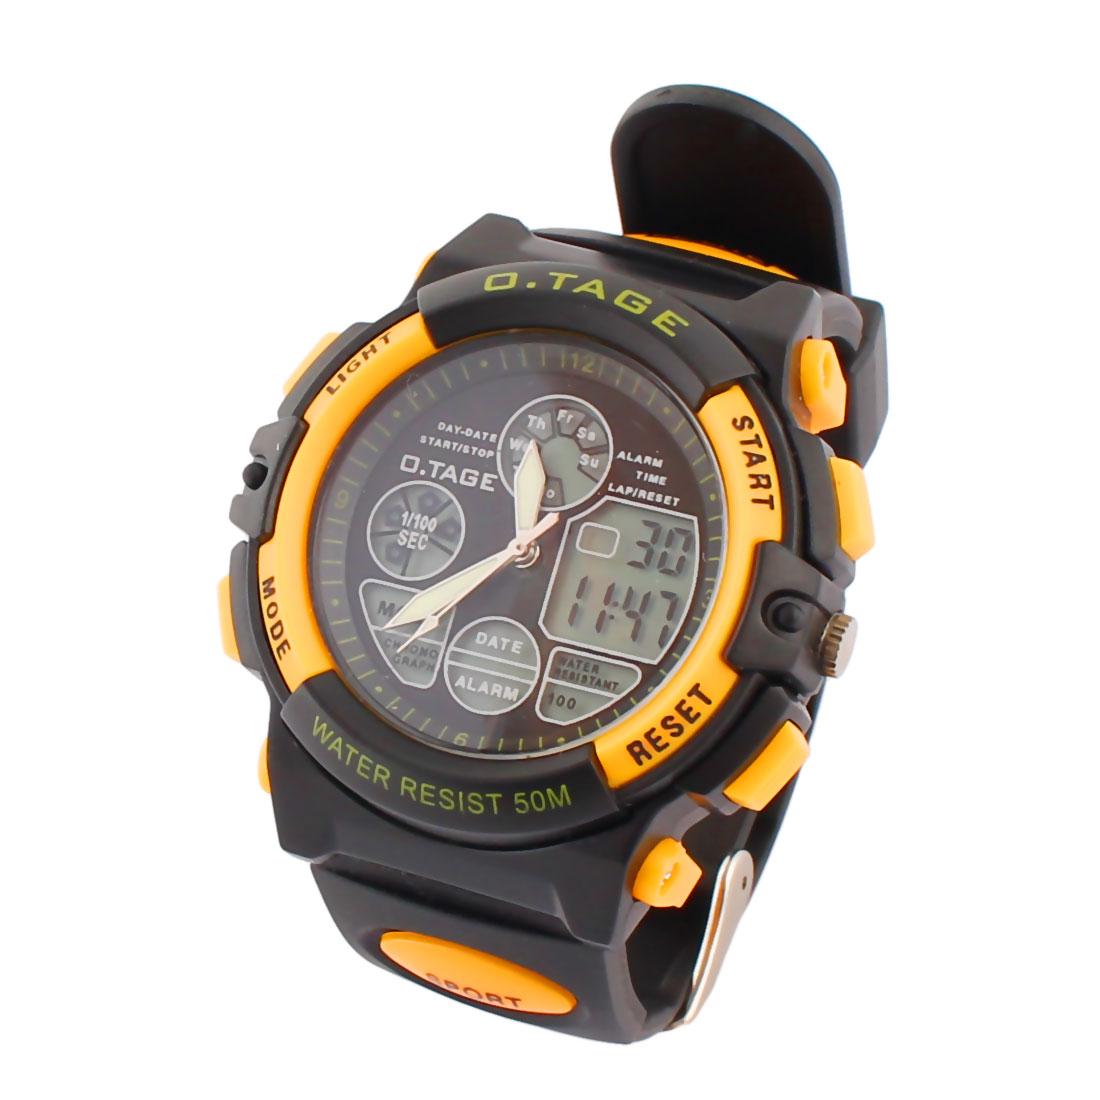 Outdoor Sports Water Resistant Luminous Peak Climbing Watch Black Yellow